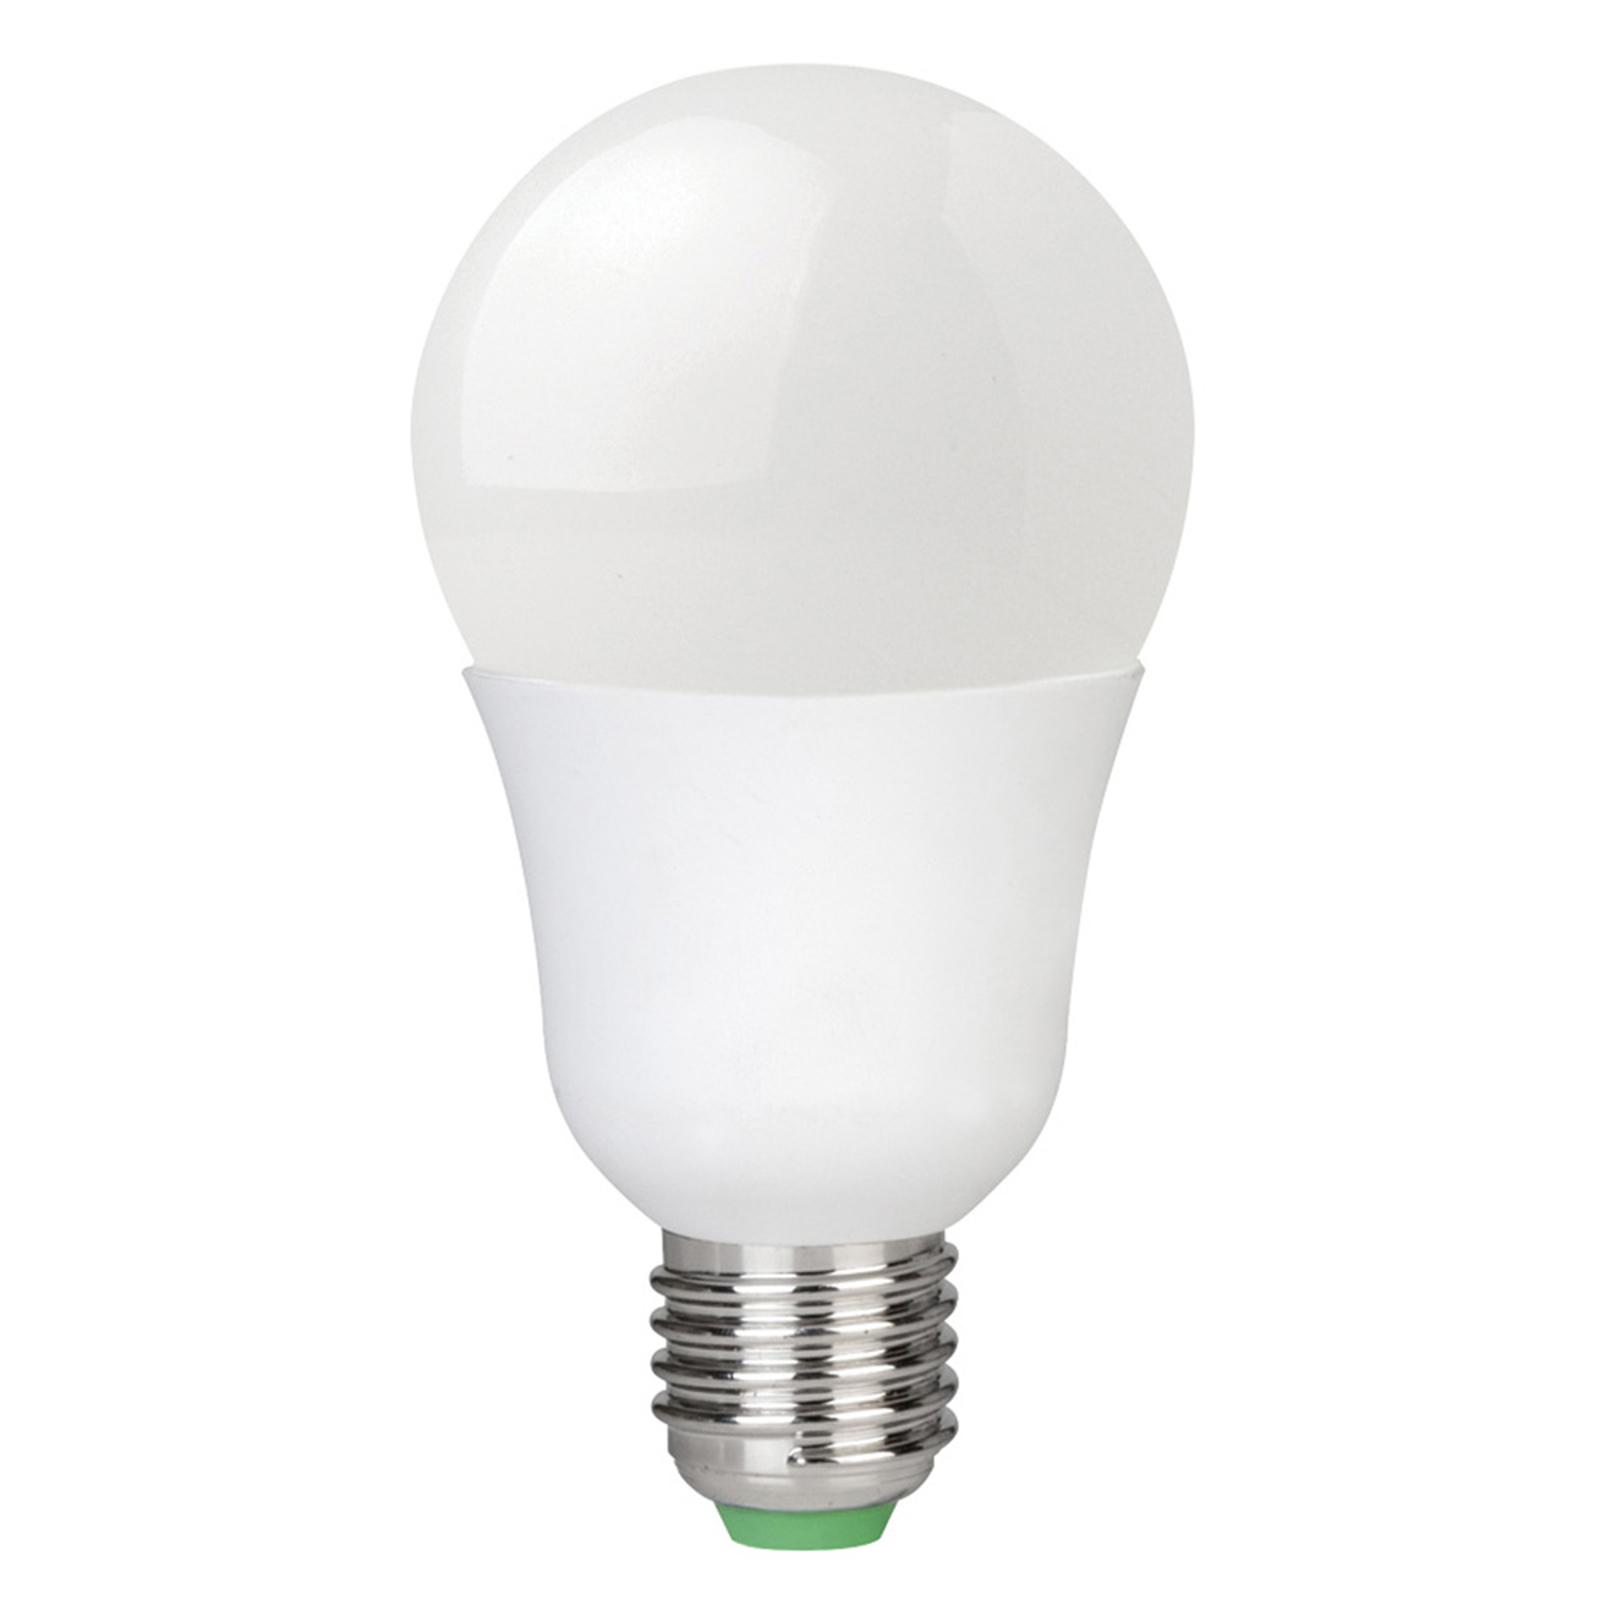 E27 11W 828 LED-lampa MEGAMAN Smart Lighting